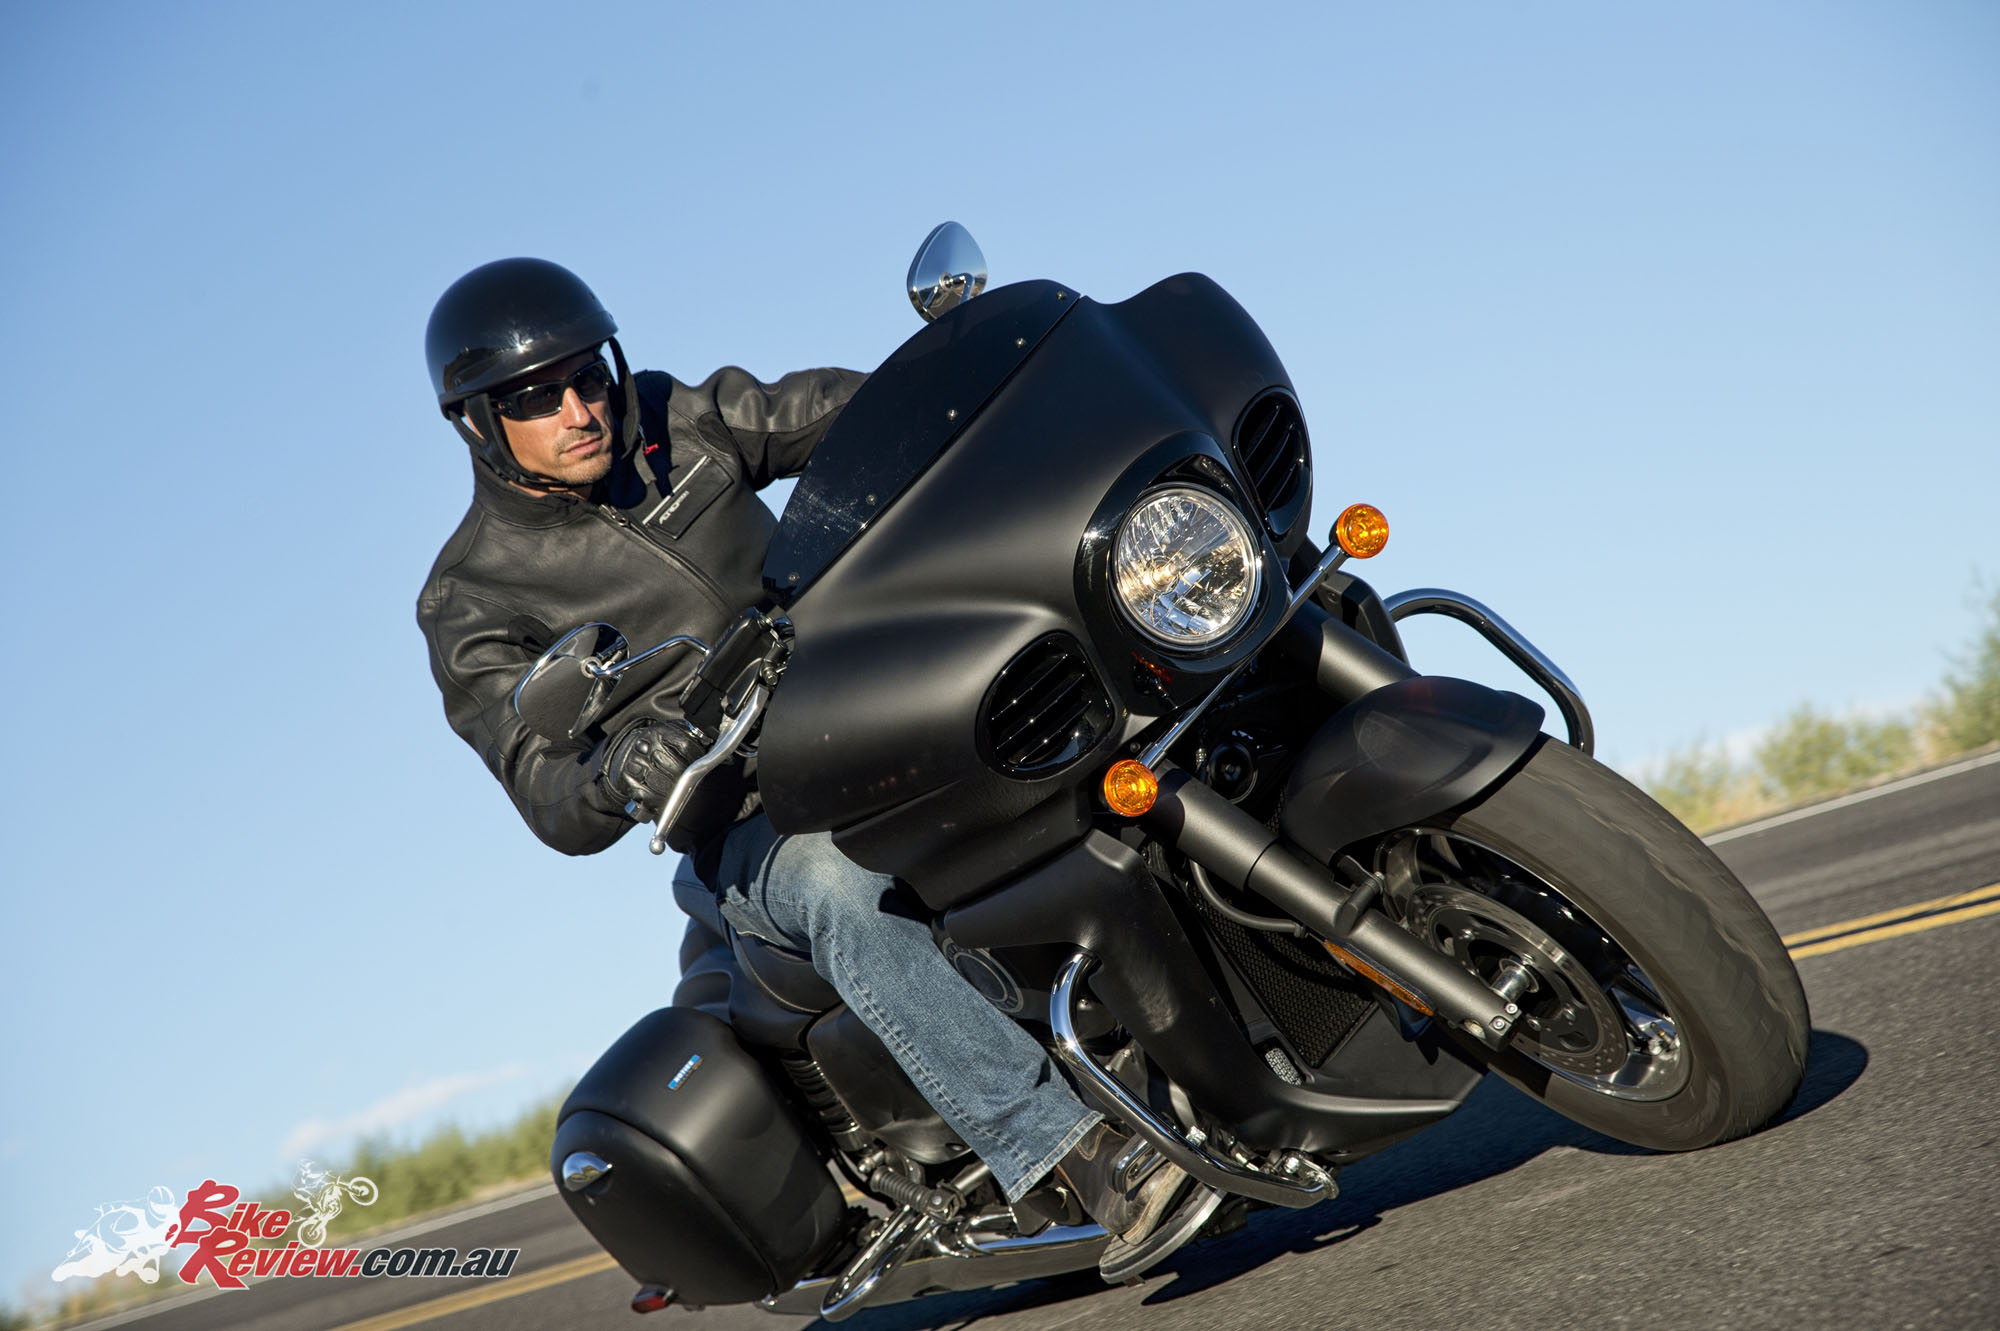 Review: Kawasaki Vulcan 1700 Vaquero - Bike Review